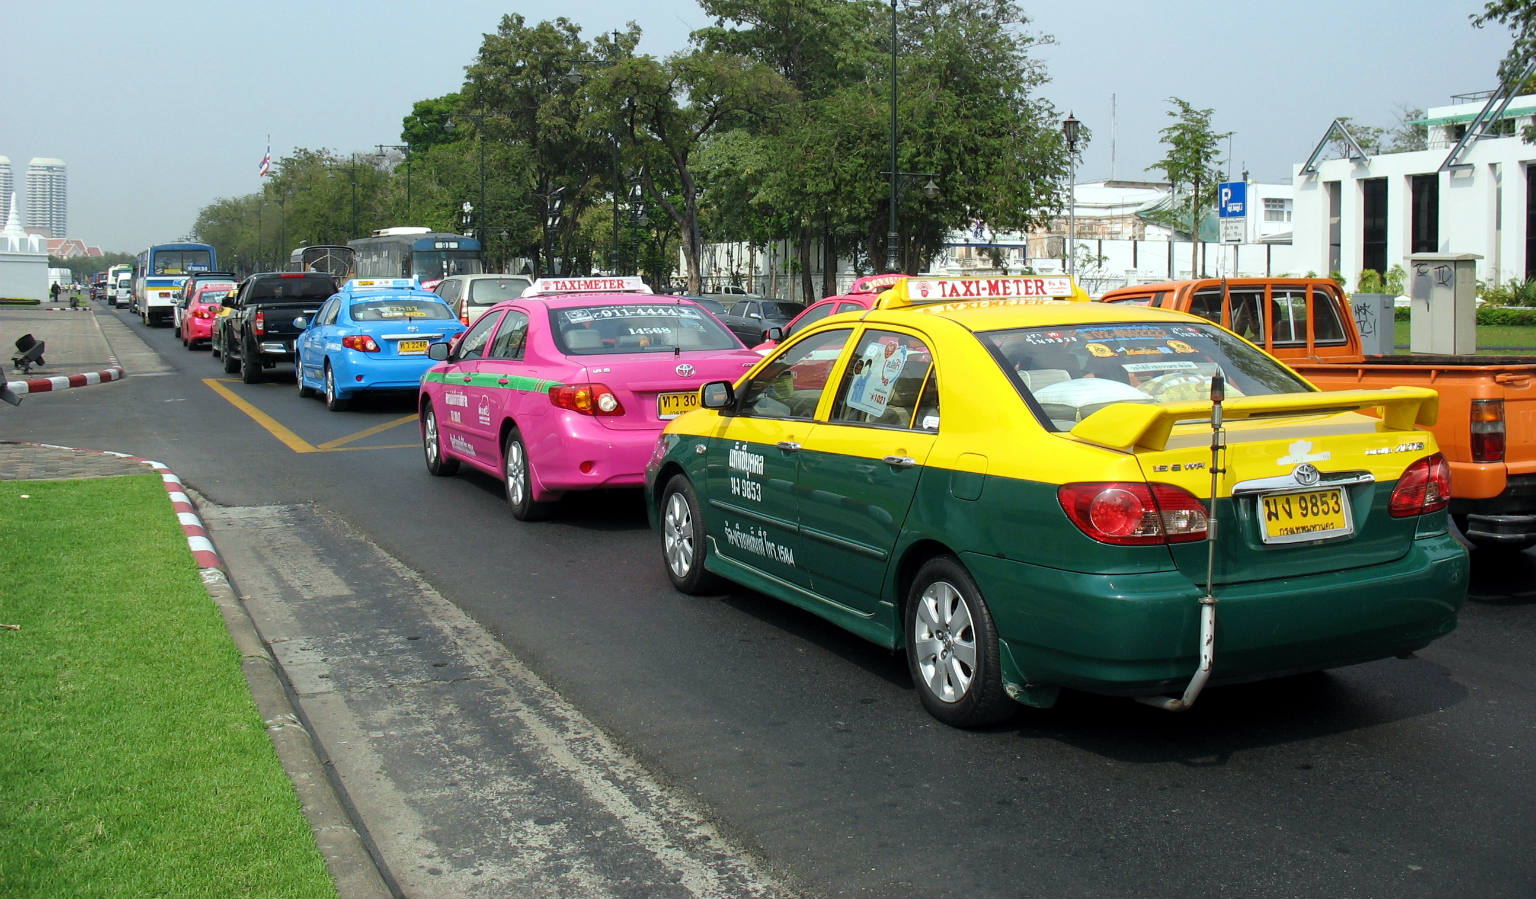 Groene, rose en blauwe taxi achter elkaar in de file